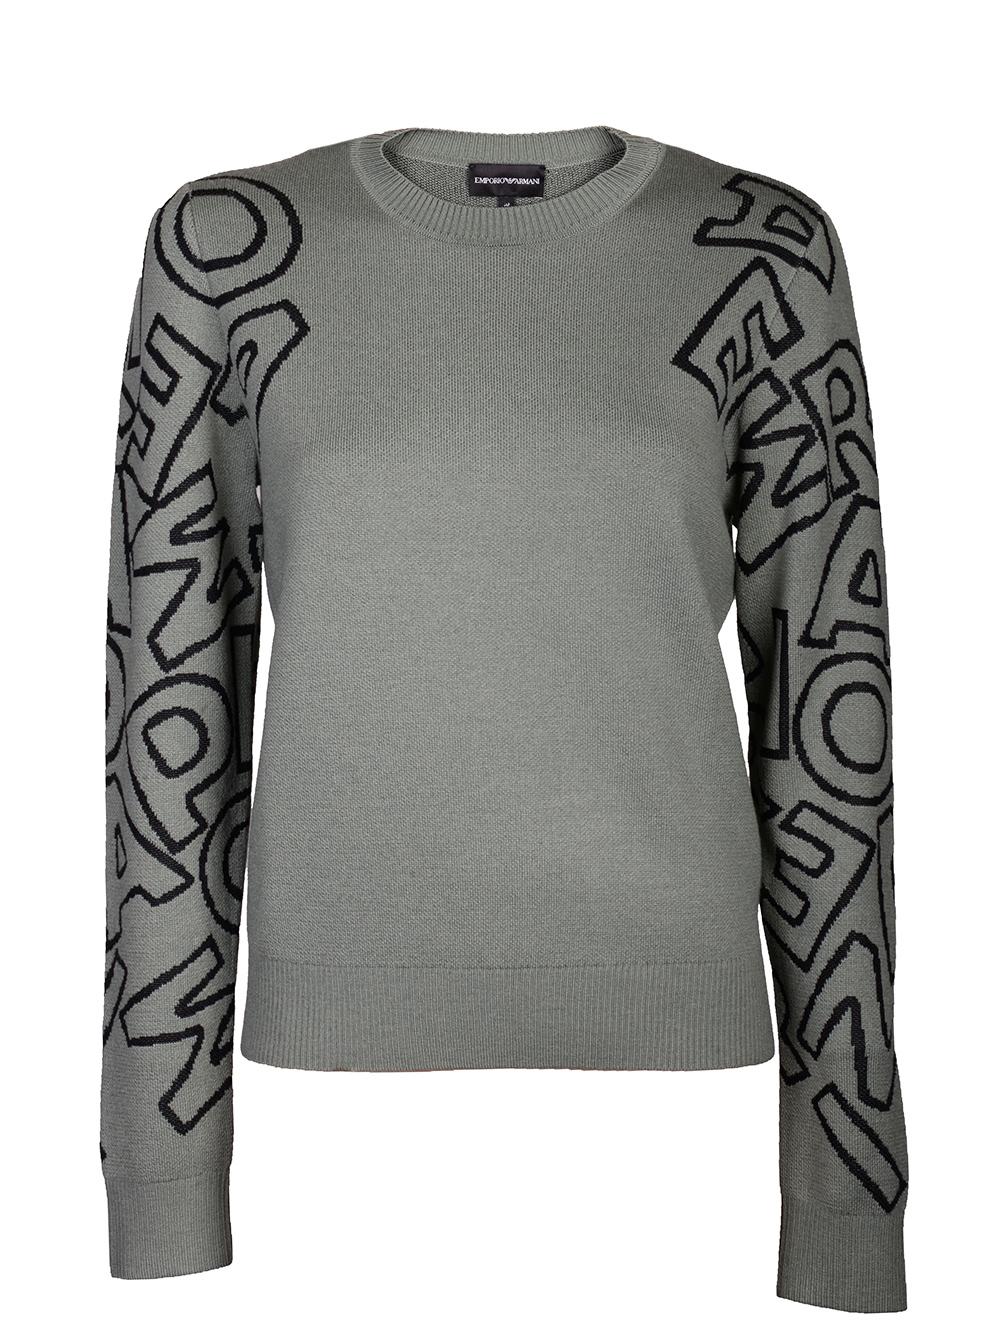 EMPORIO ARMANI Μπλούζα πουλόβερ 6G2MTC 2M15Z ΠΡΑΣΙΝΟ